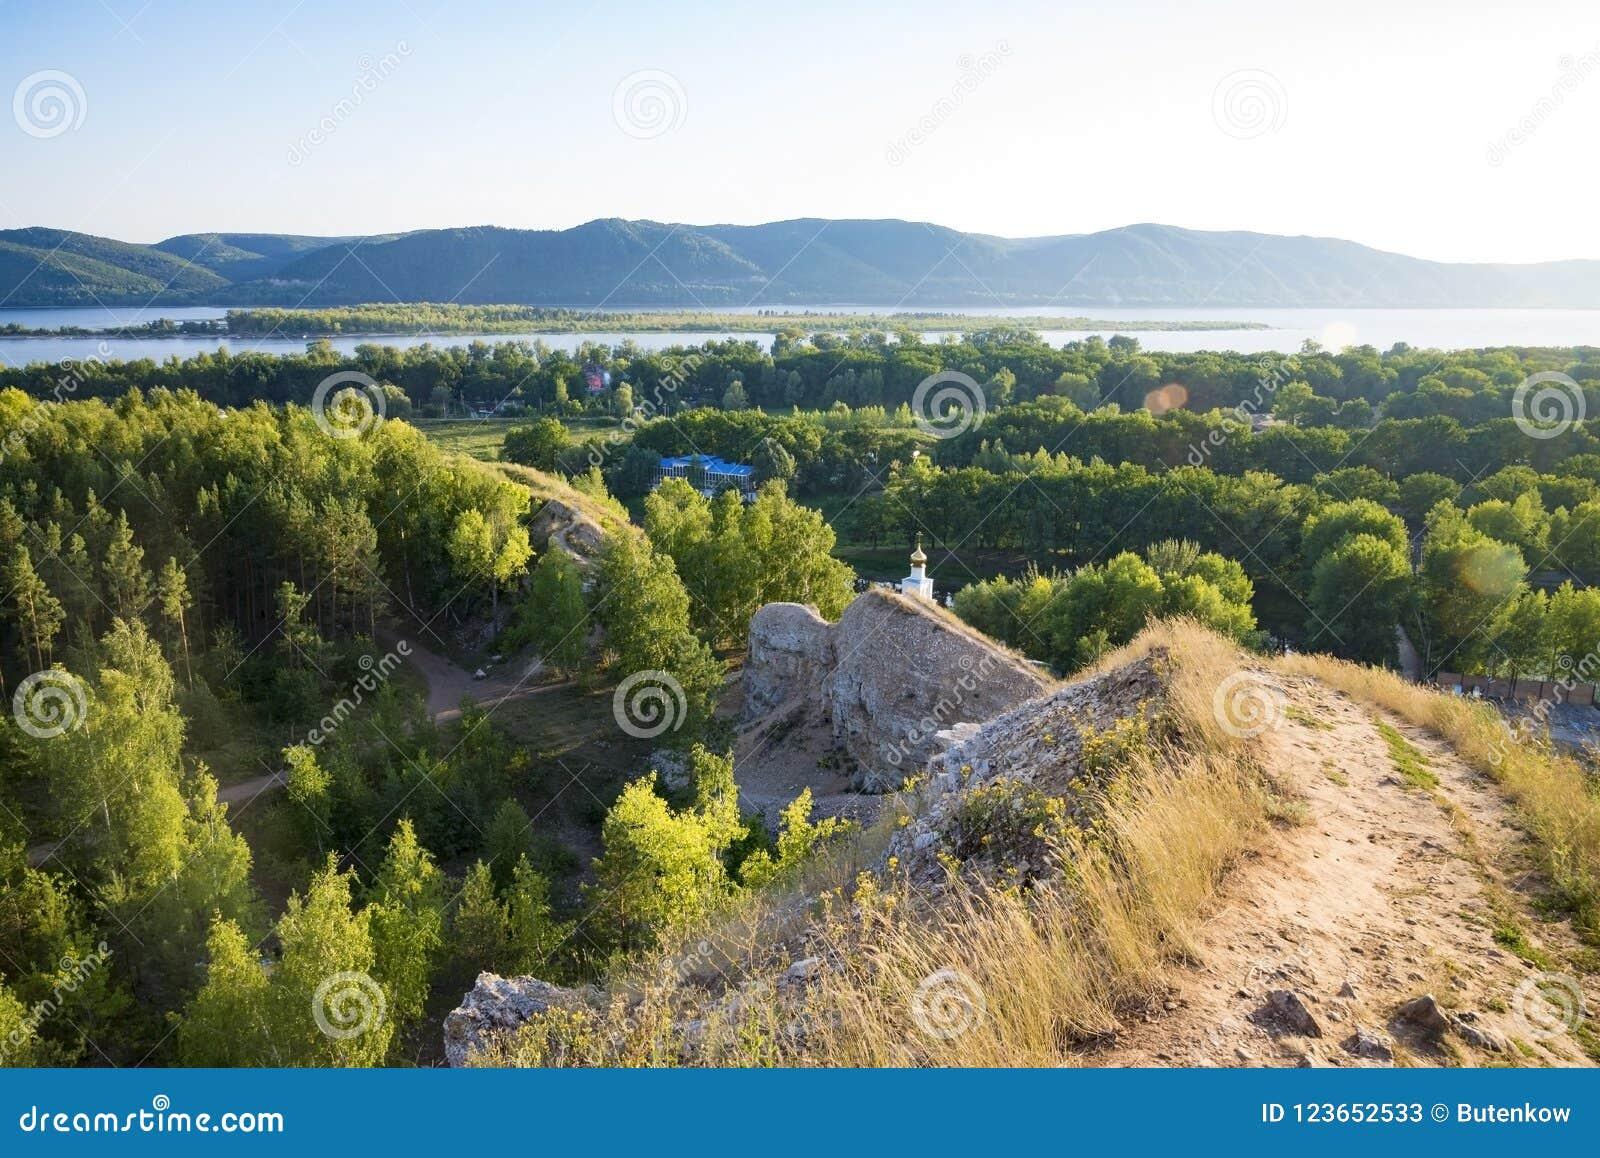 Tsarev Kurgan, Samara: description, location and interesting facts 71